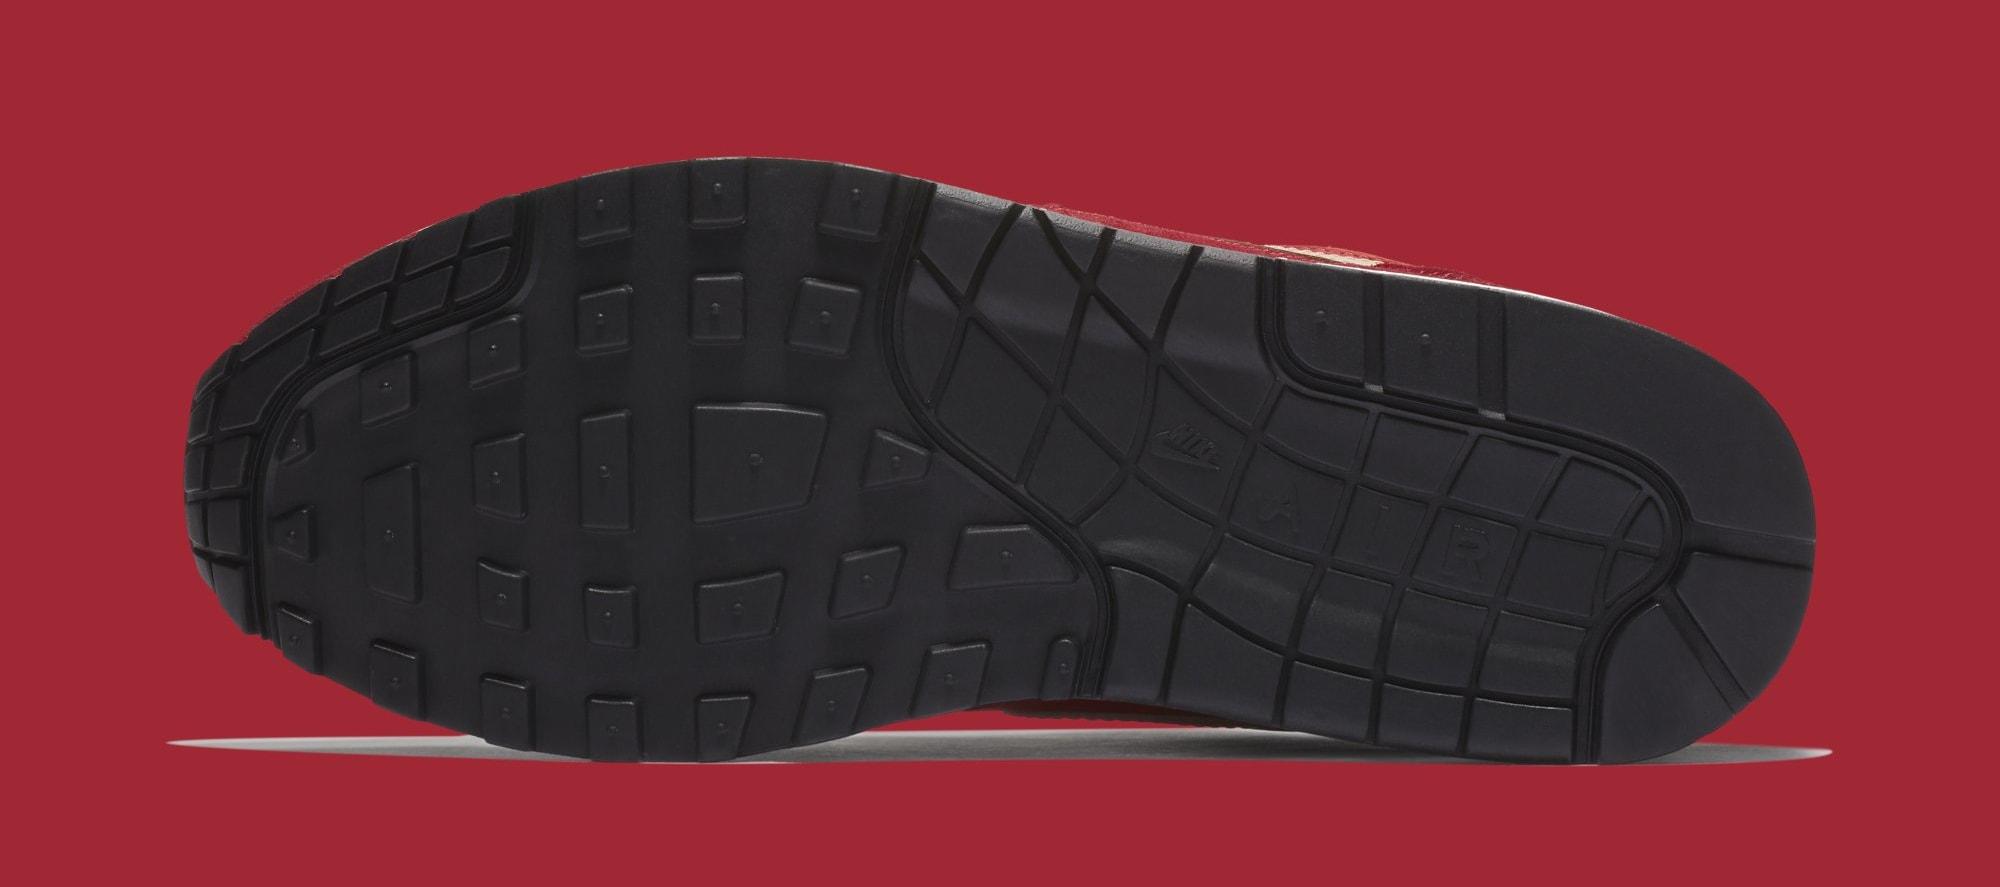 Atmos x Nike Air Max 1 'Red Curry' 908366-600 (Bottom)